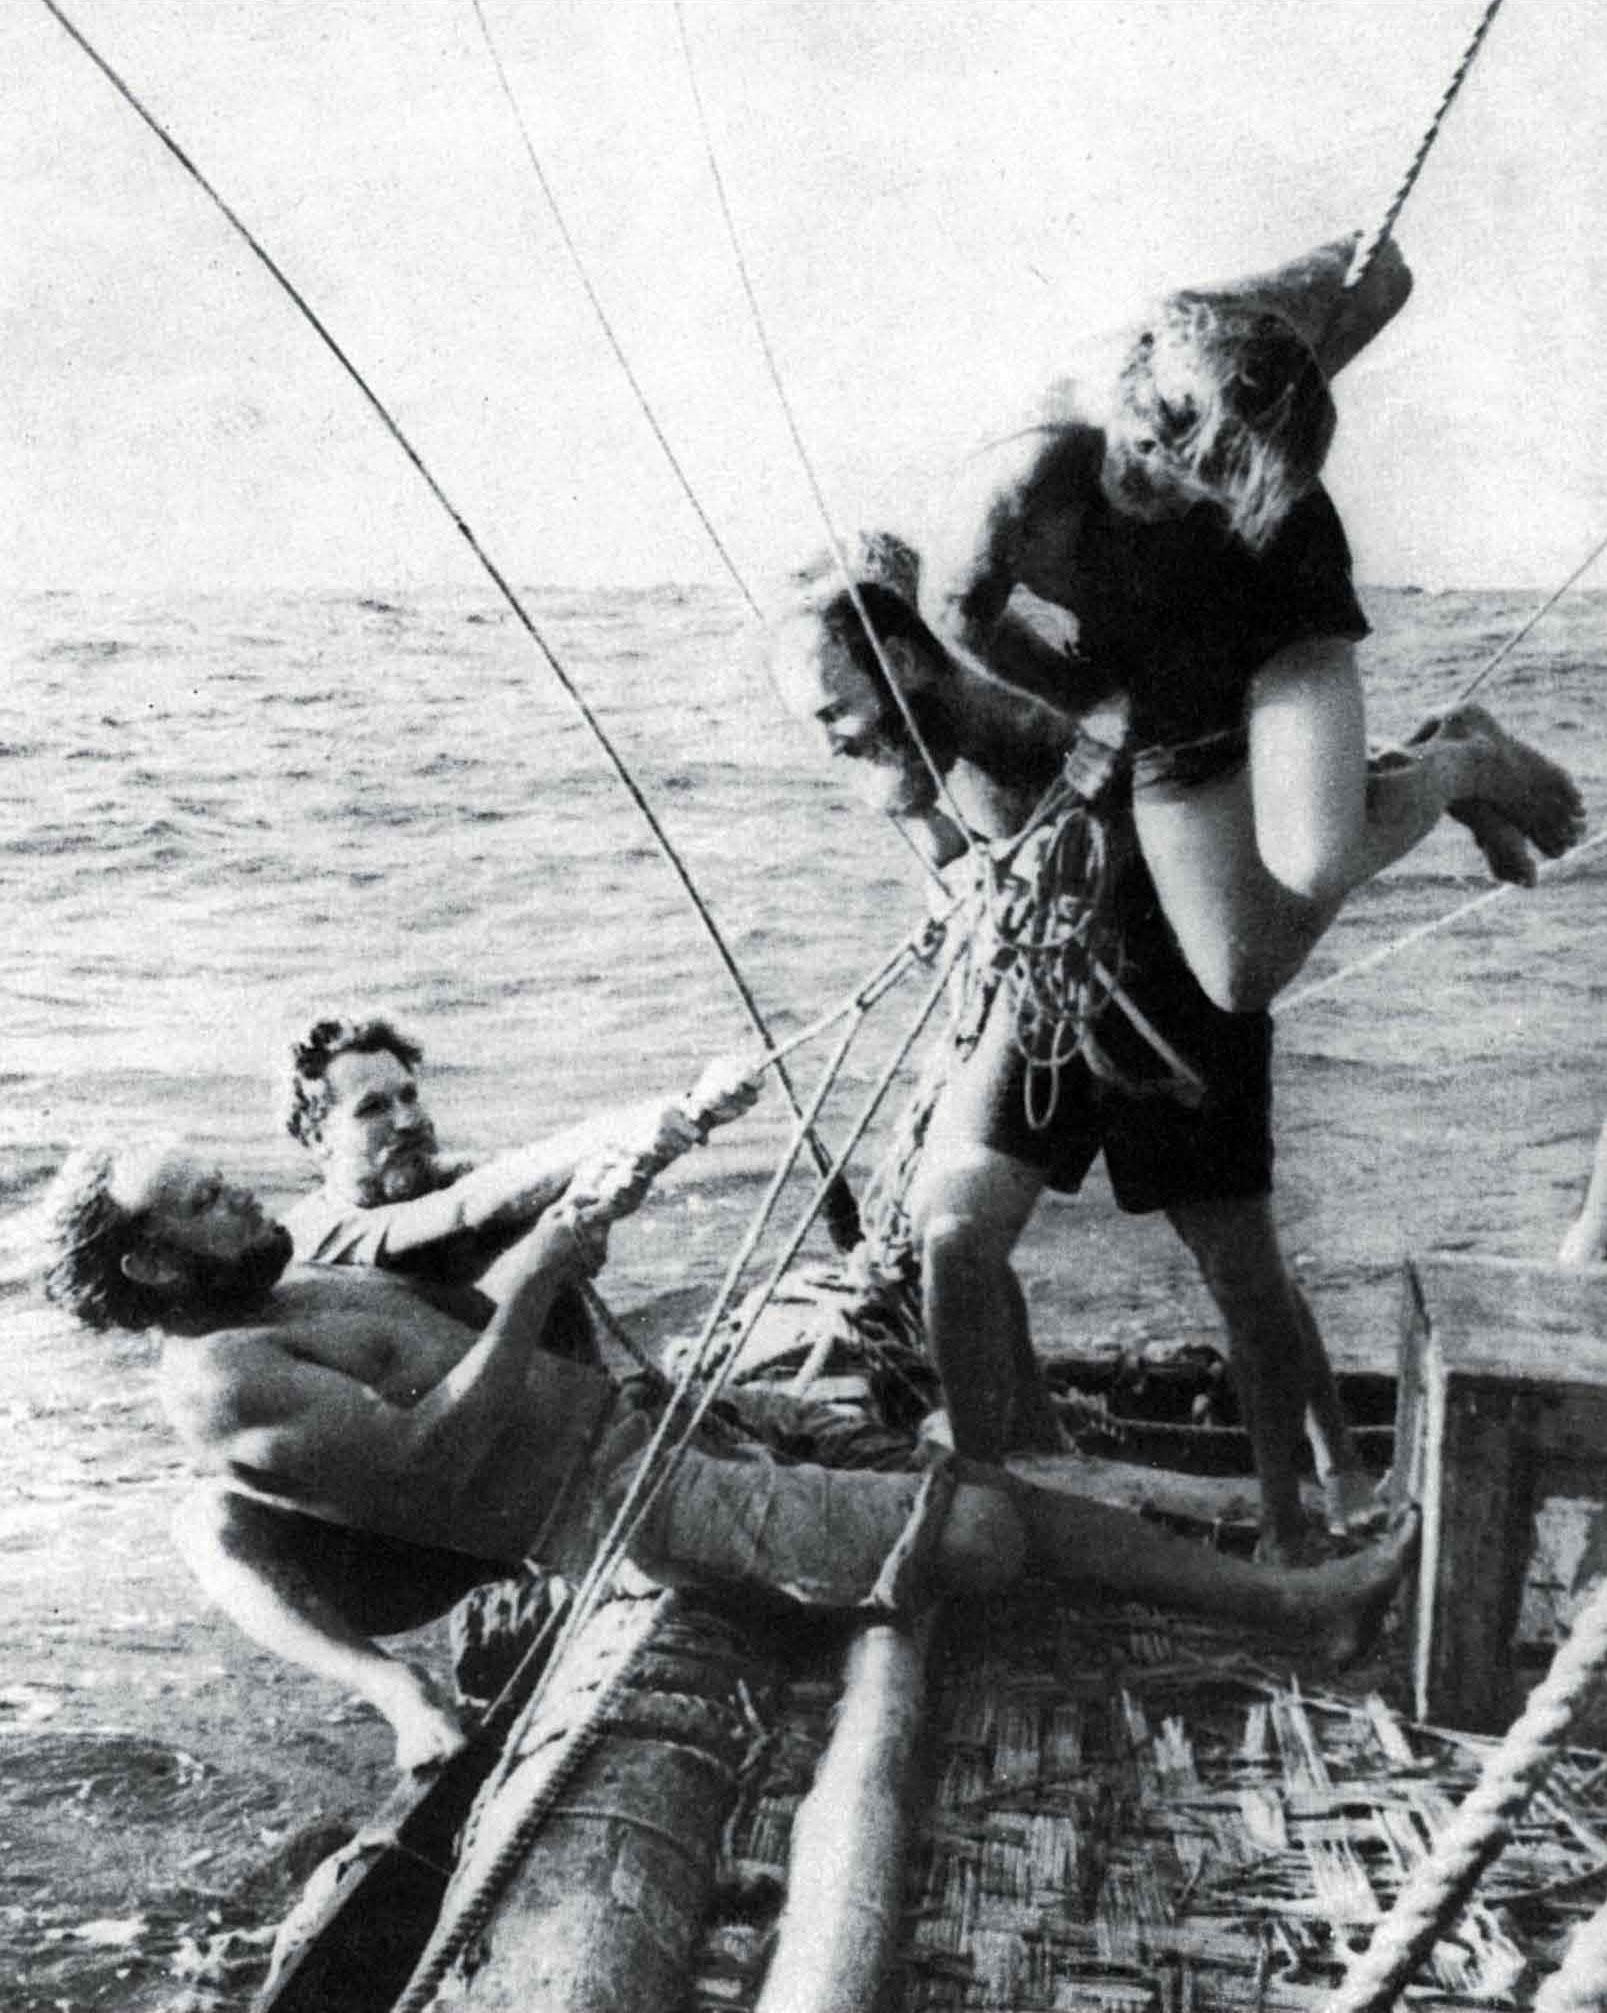 Kon Tiki: Tightening slackened ropes